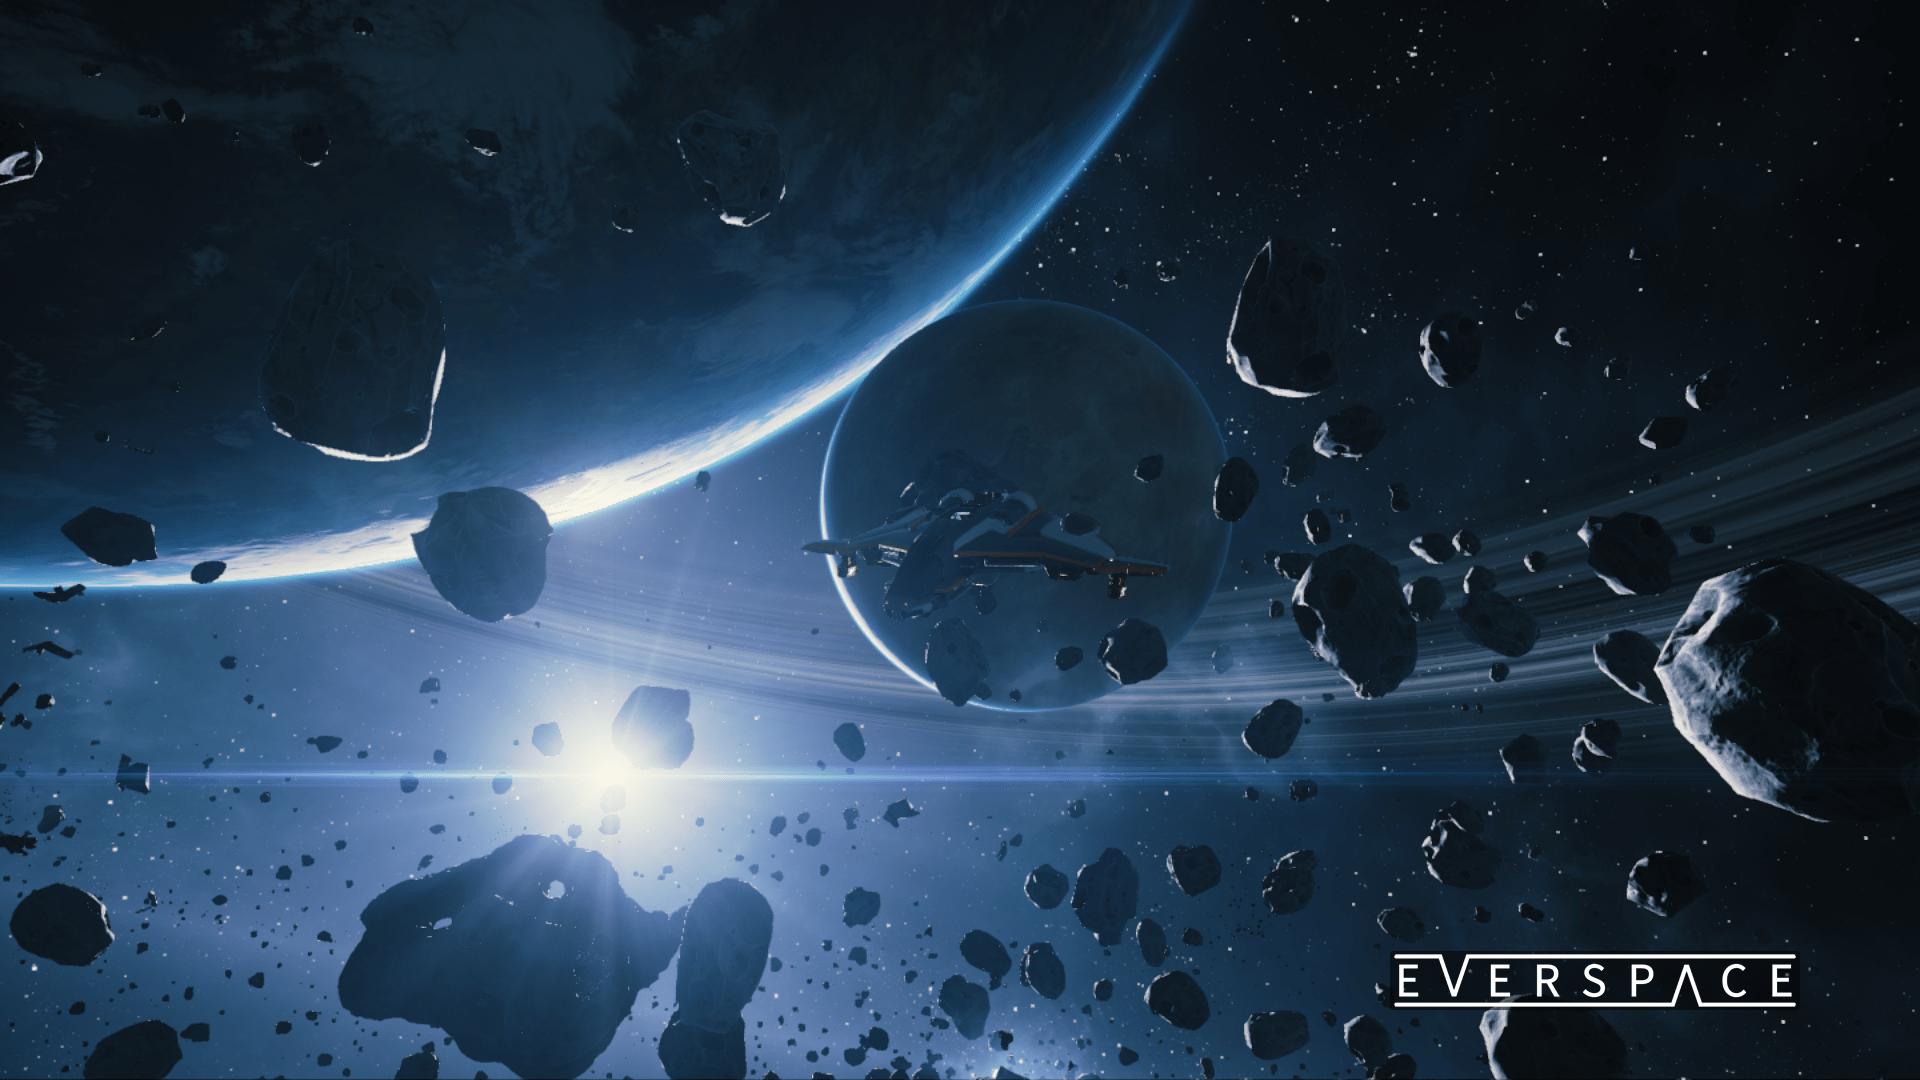 Everspace Screenhot 1